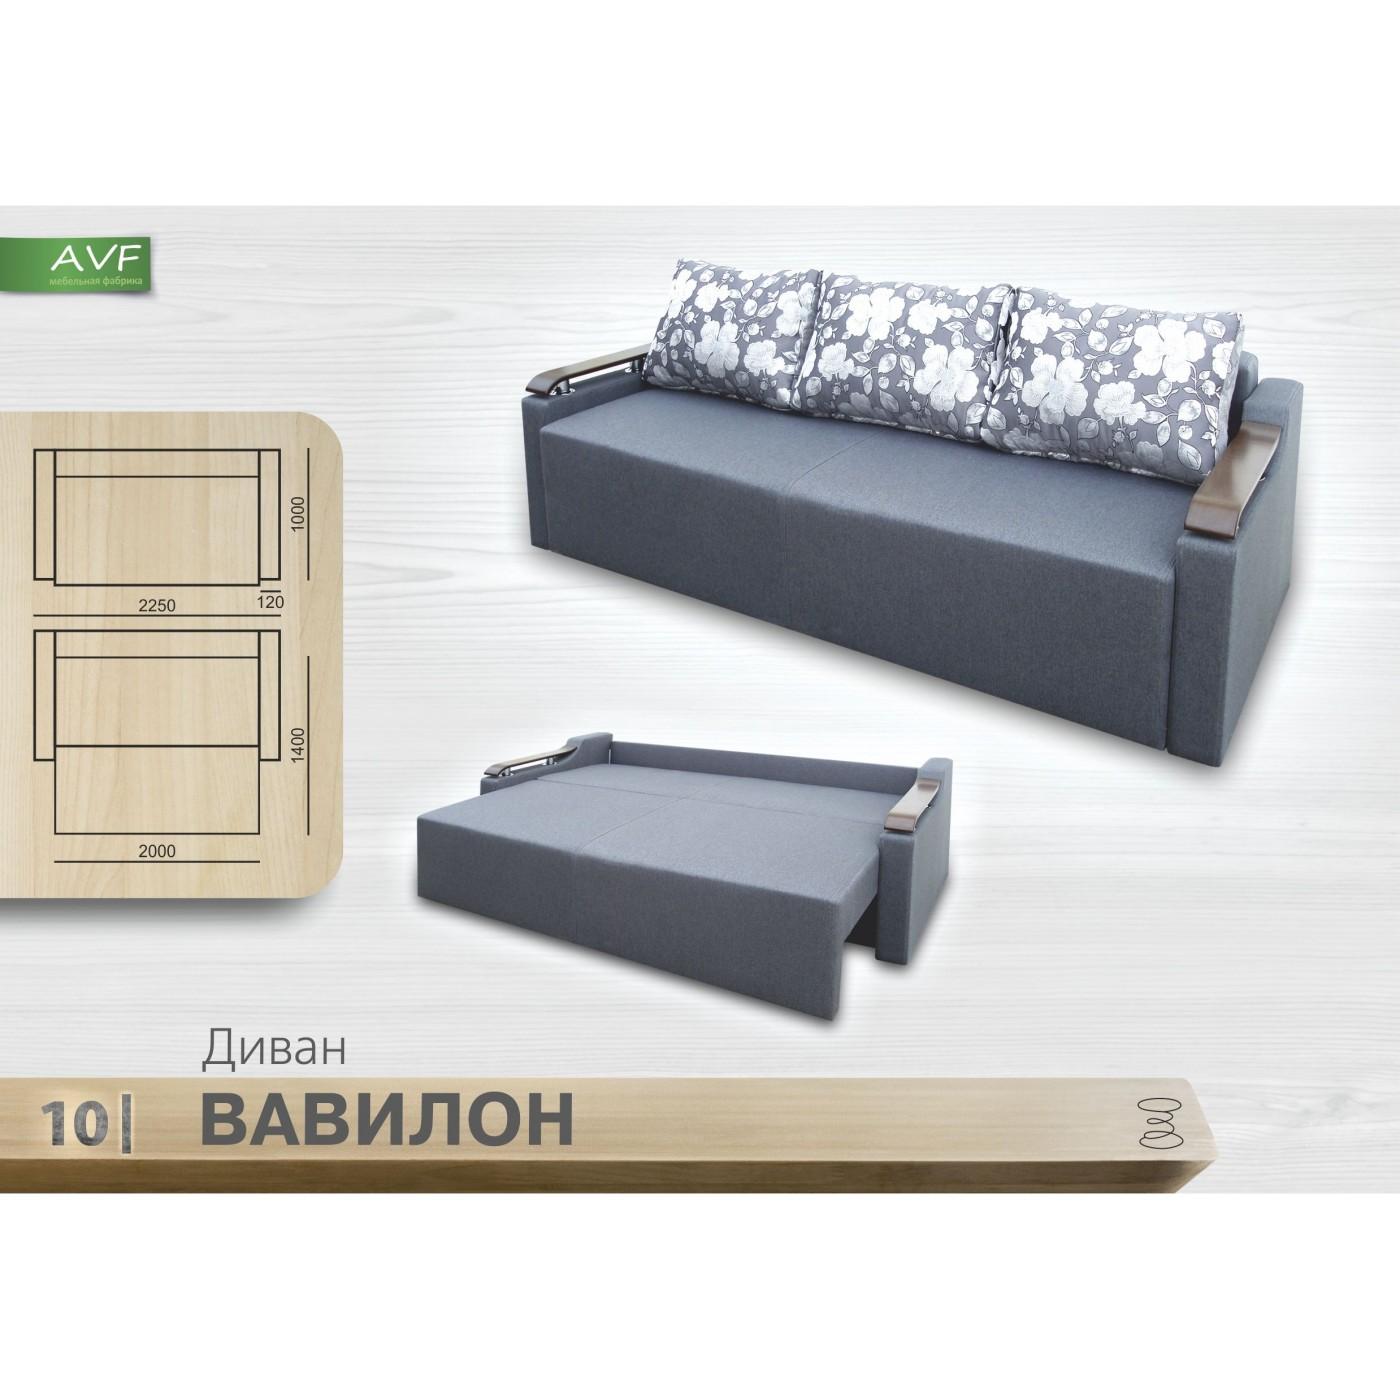 Вавилон диван (пружинный блок)